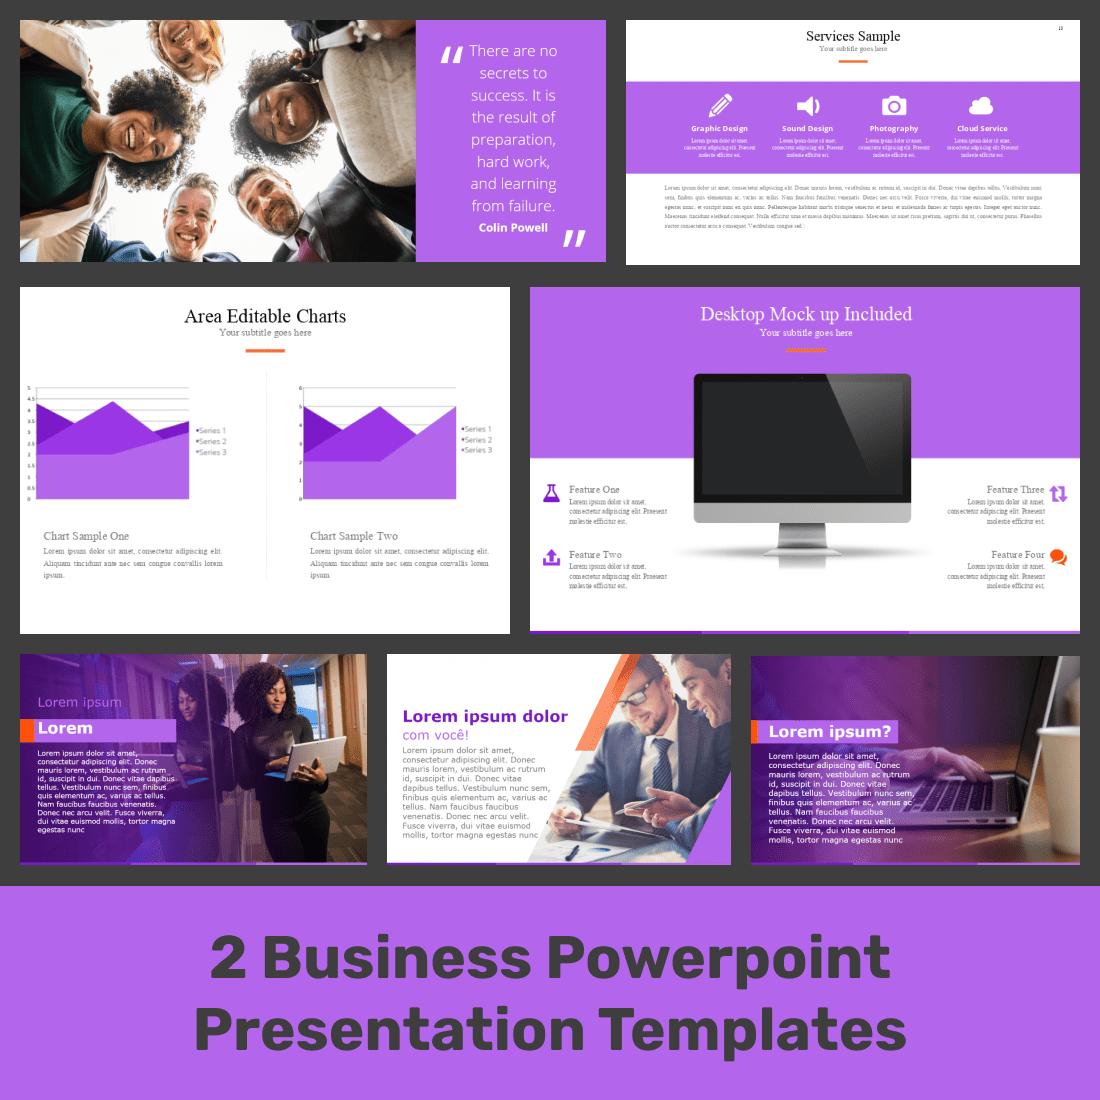 Business Powerpoint Presentation Templates